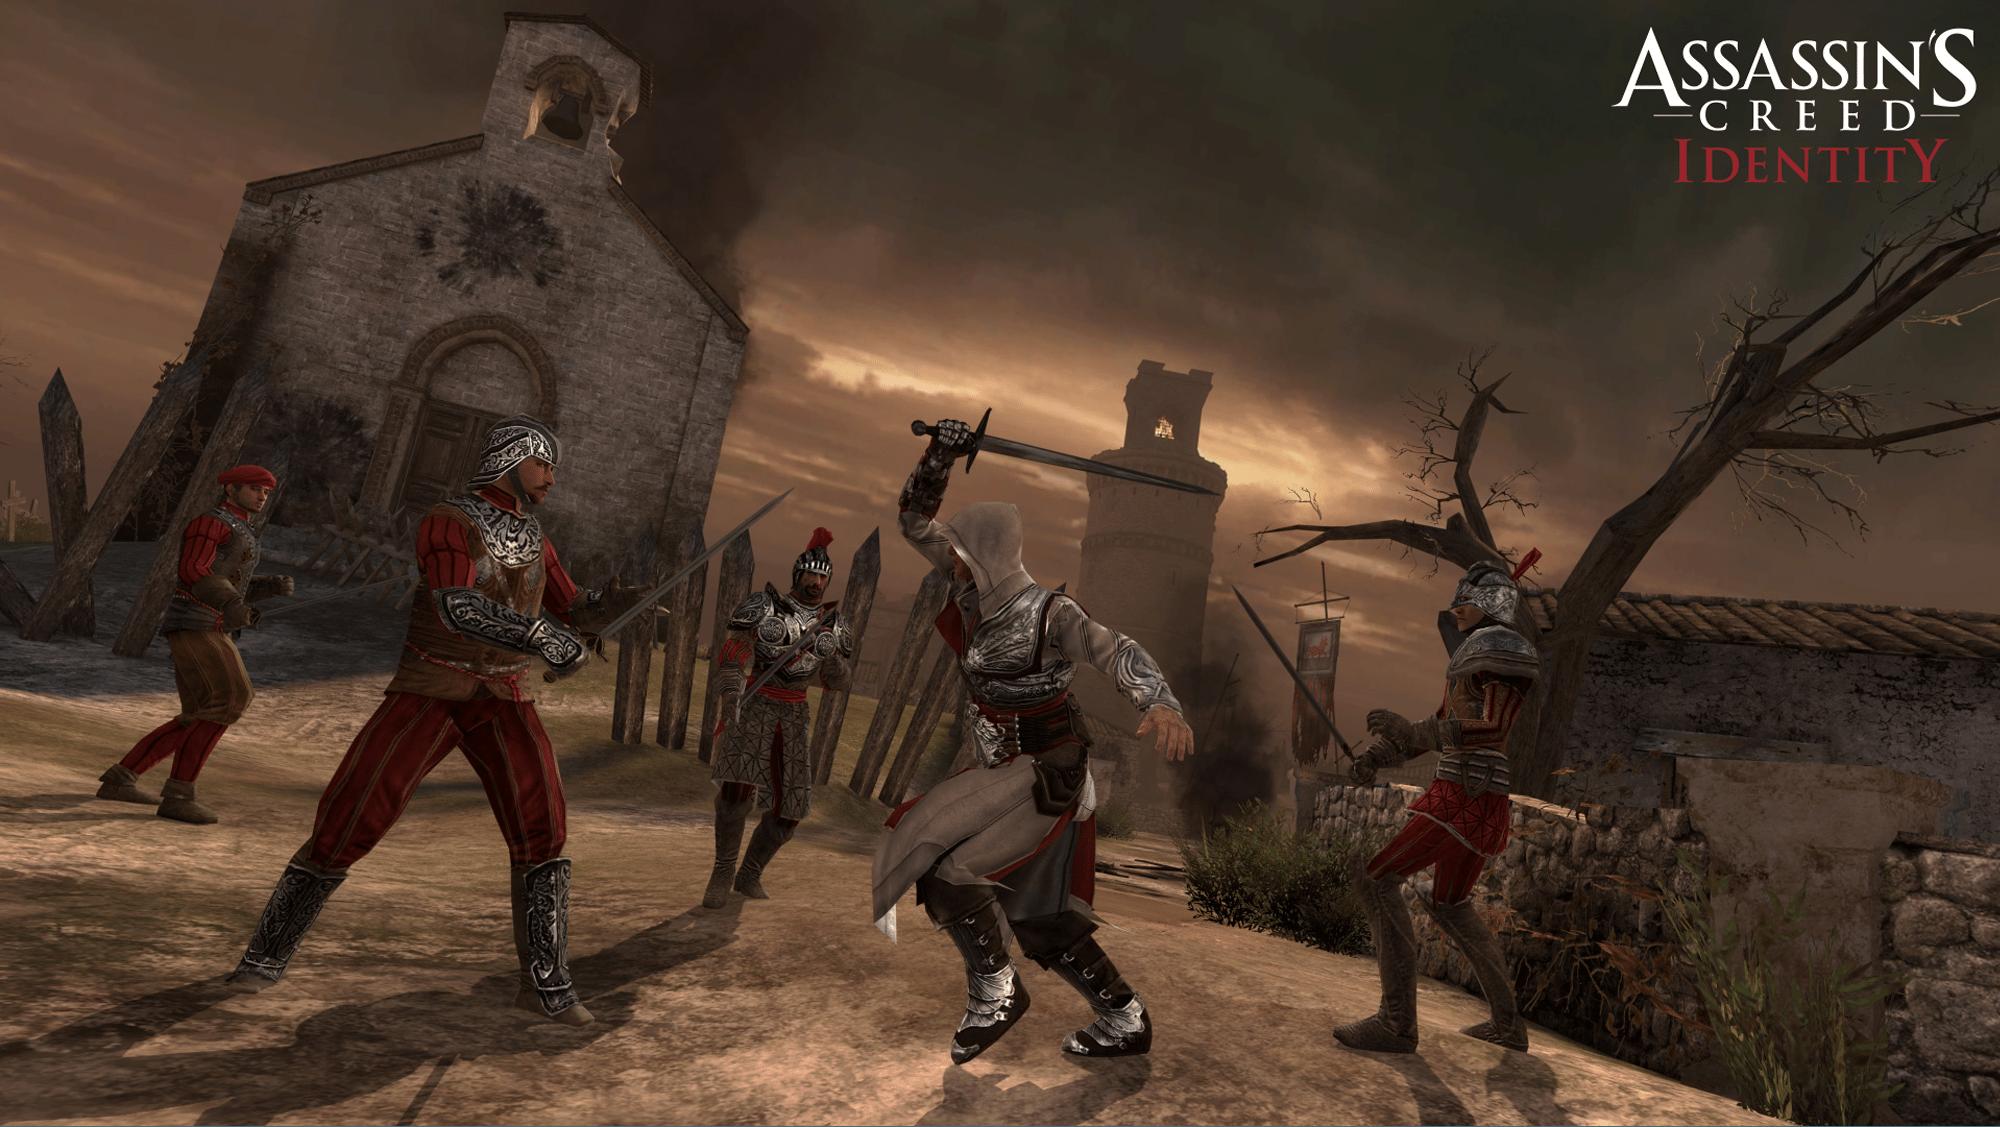 Обзор игры Assassin's Creed: Identity [Android]